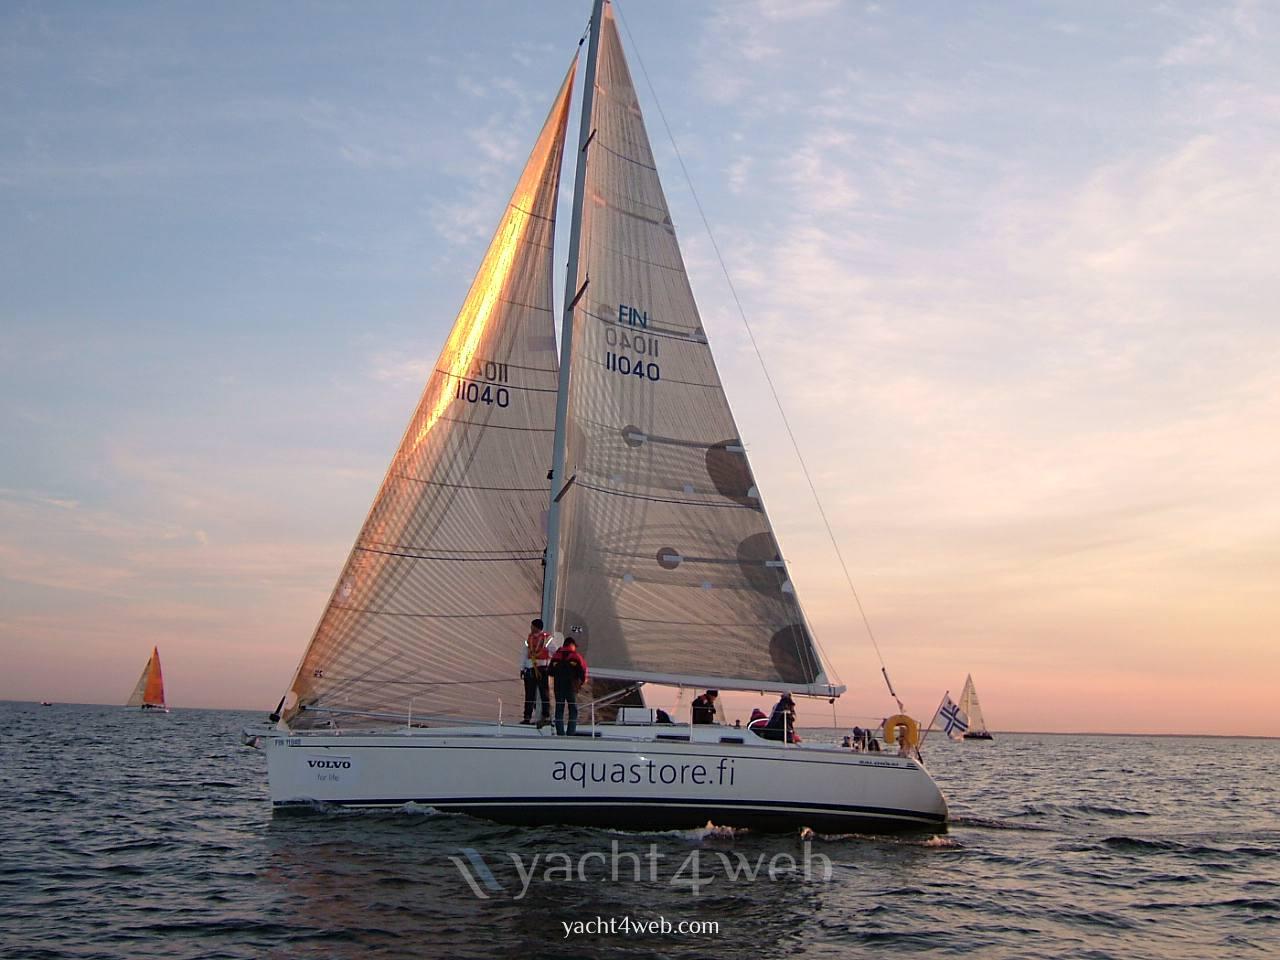 Ad boats Ad 40 salona